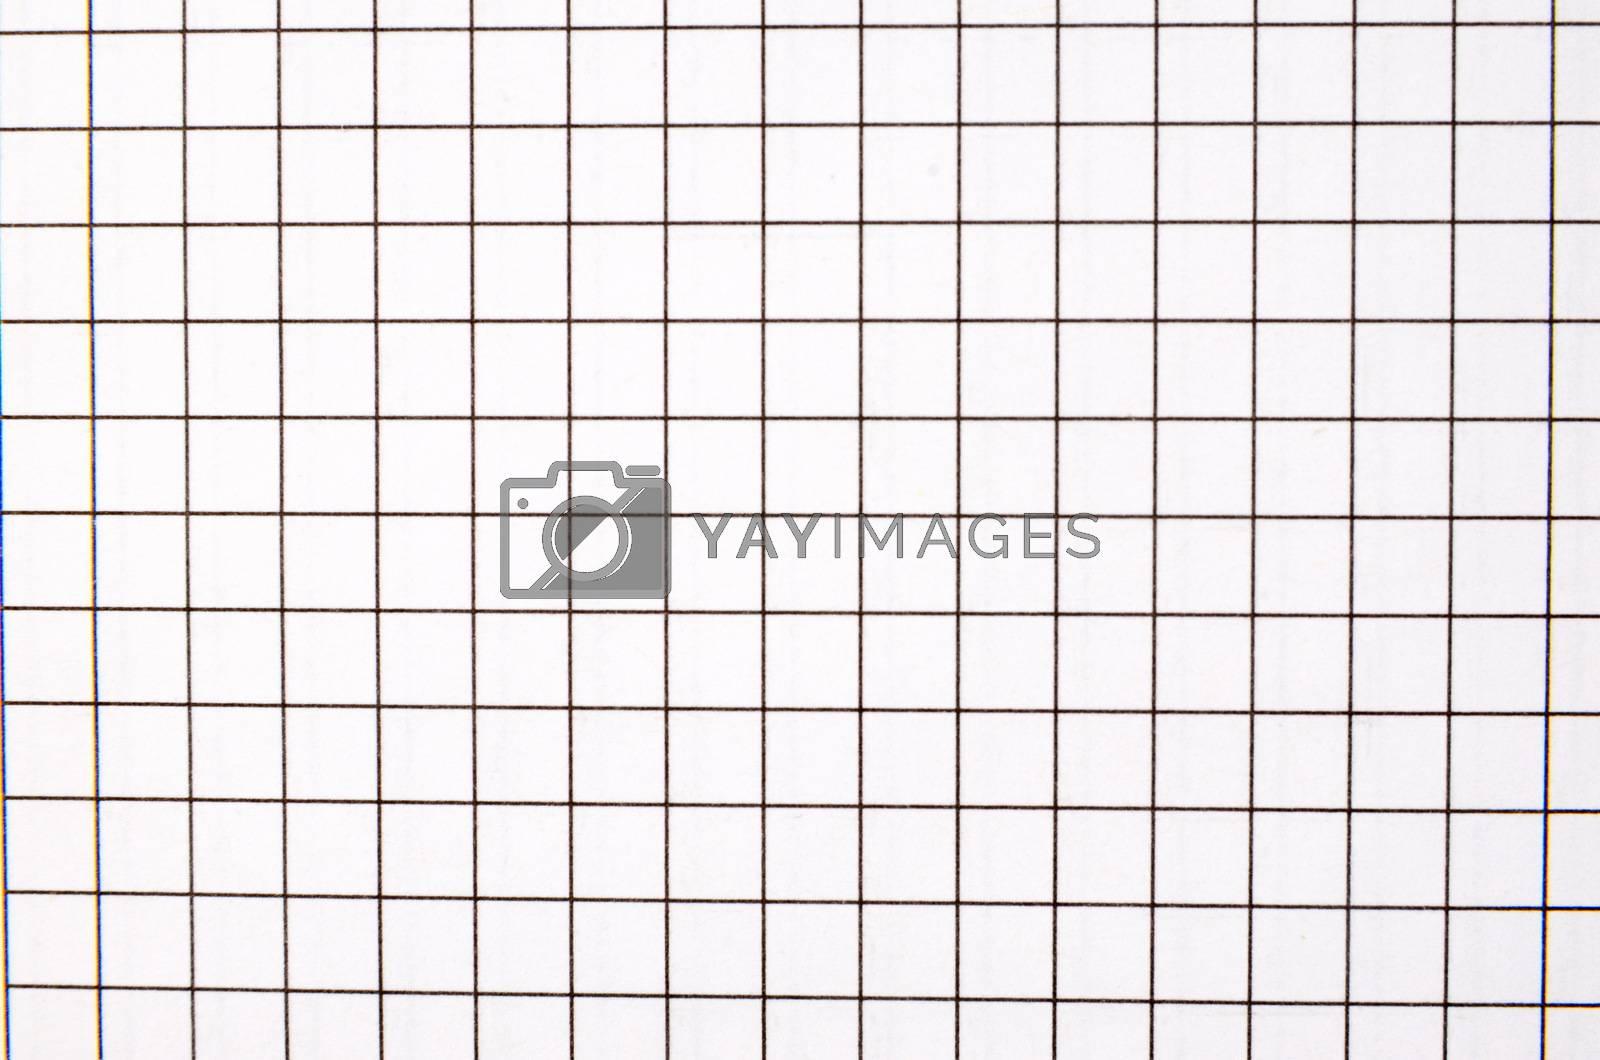 School note book sheet view closeup